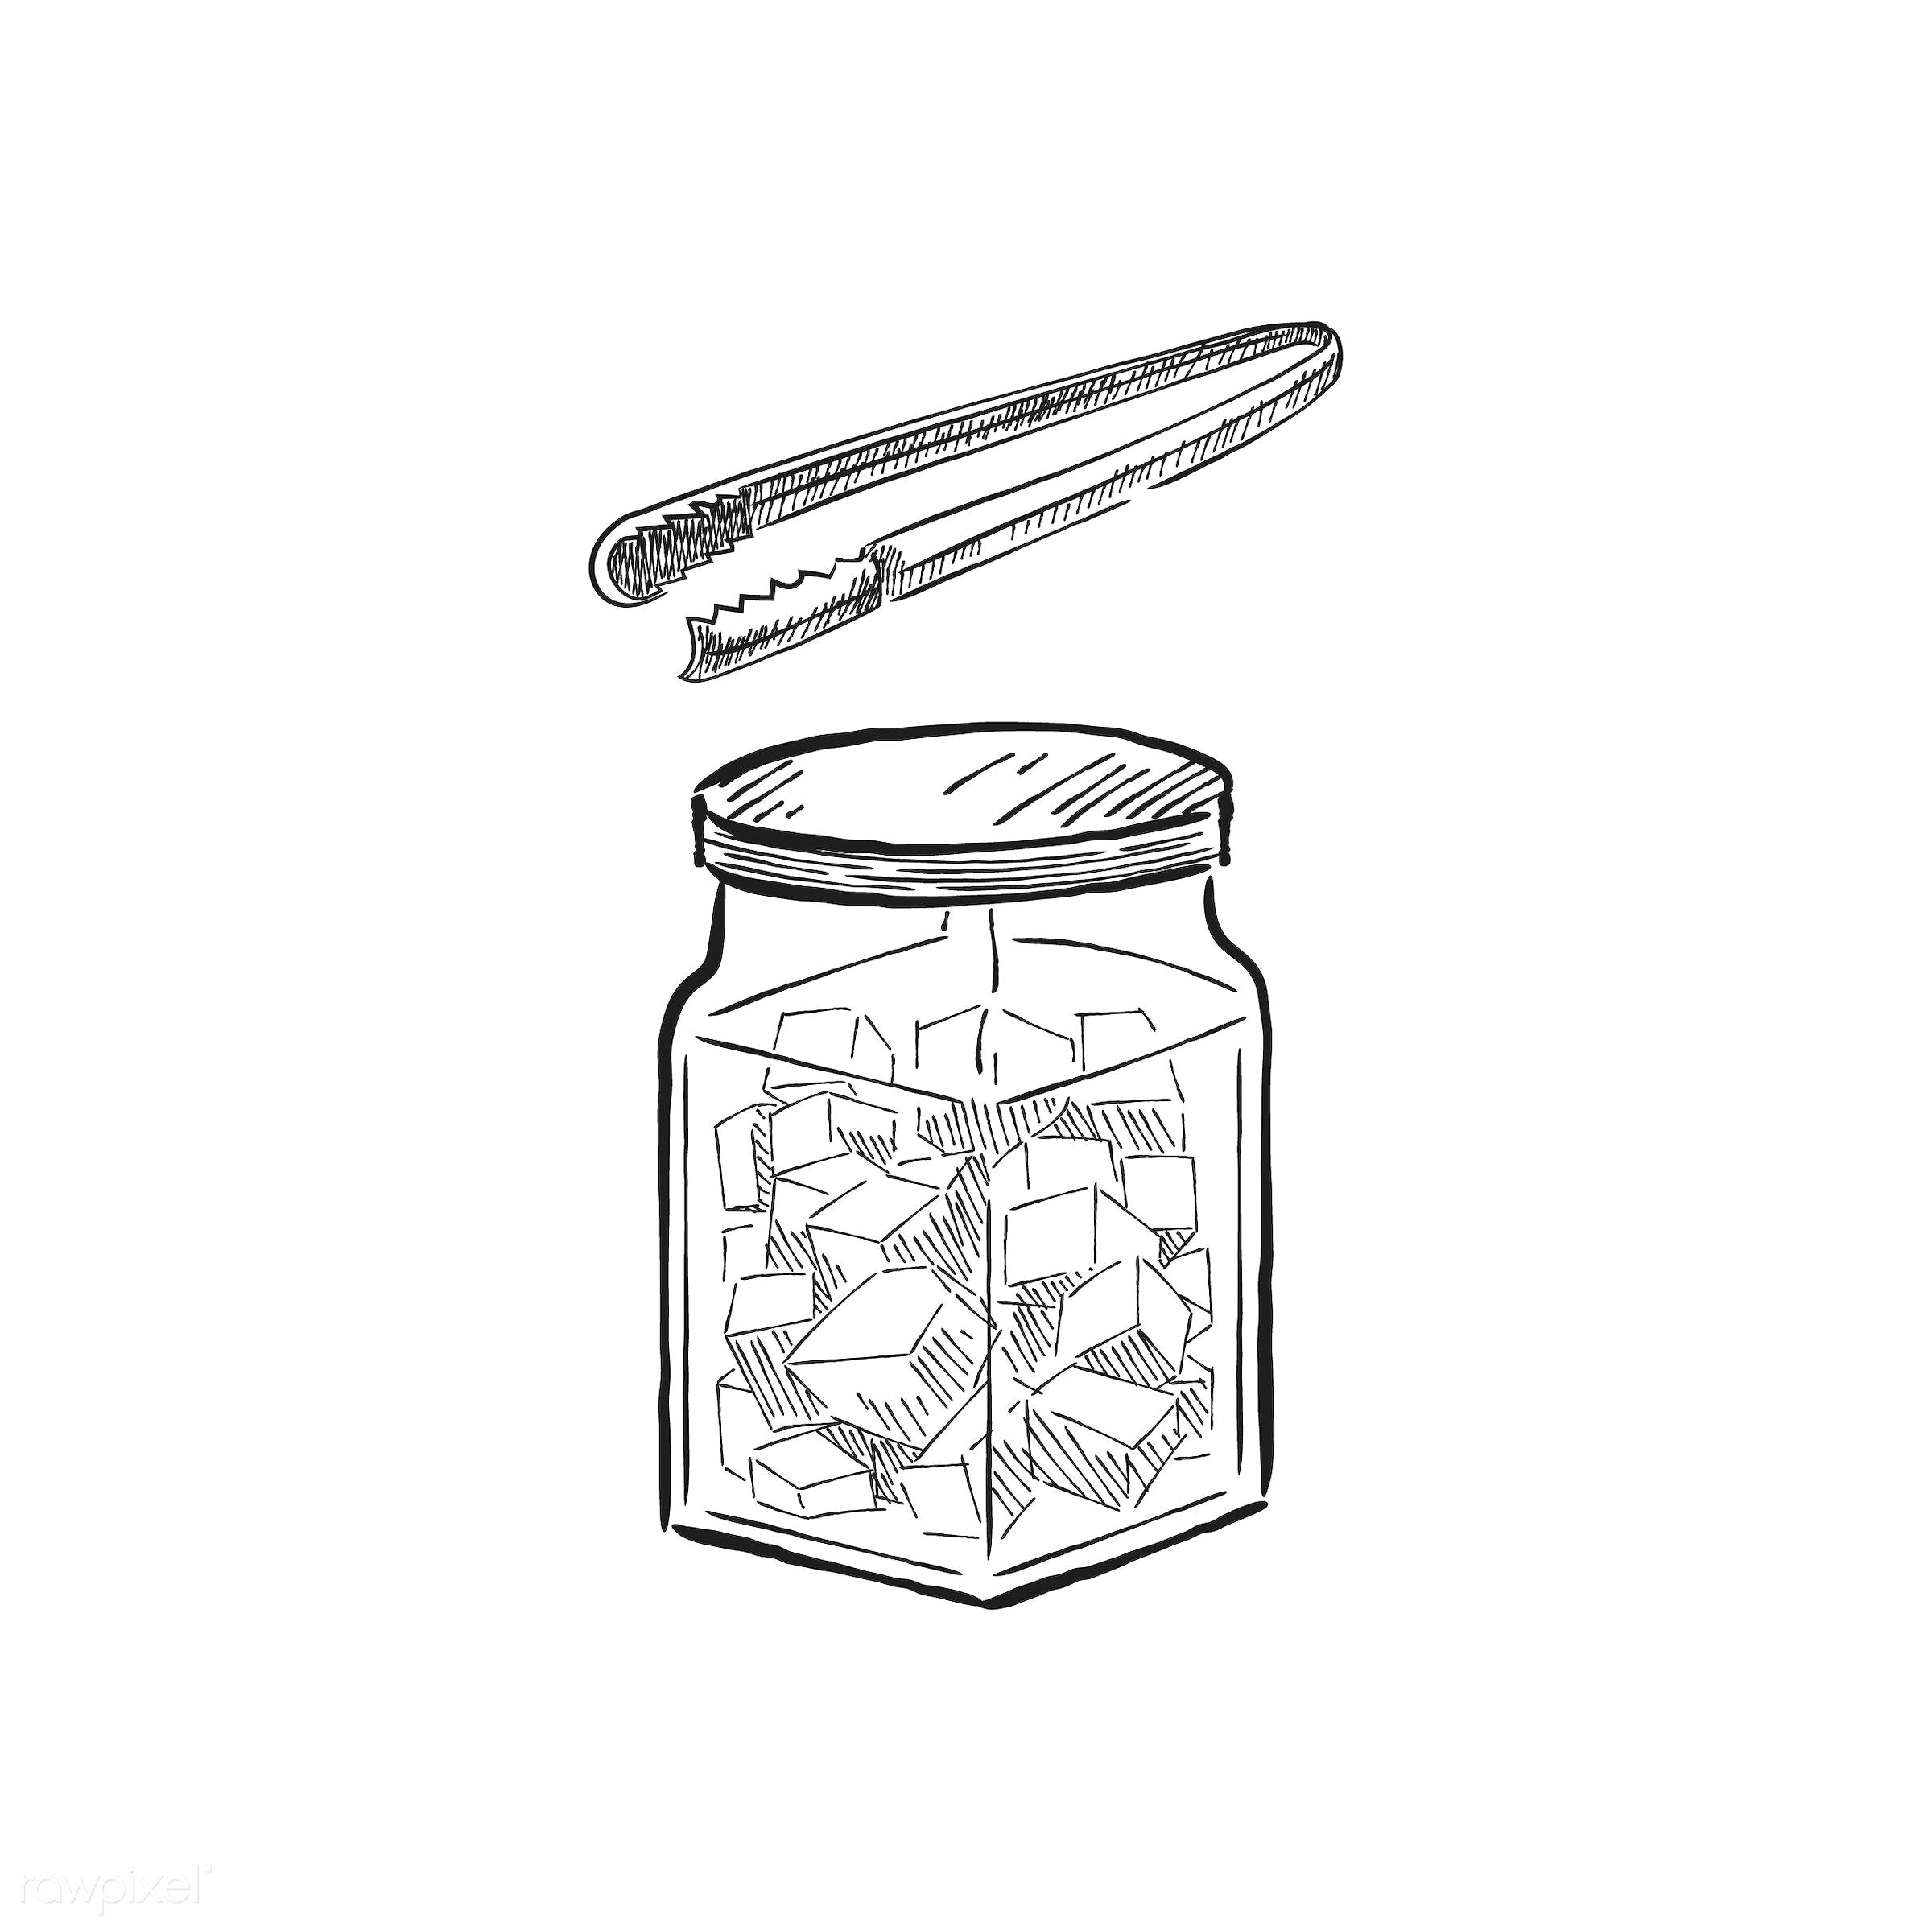 Vintage illustration of a jar with sugar cubes - antique, aroma, beverage, black, cafe, coffee, coffee shop, design, drawing...